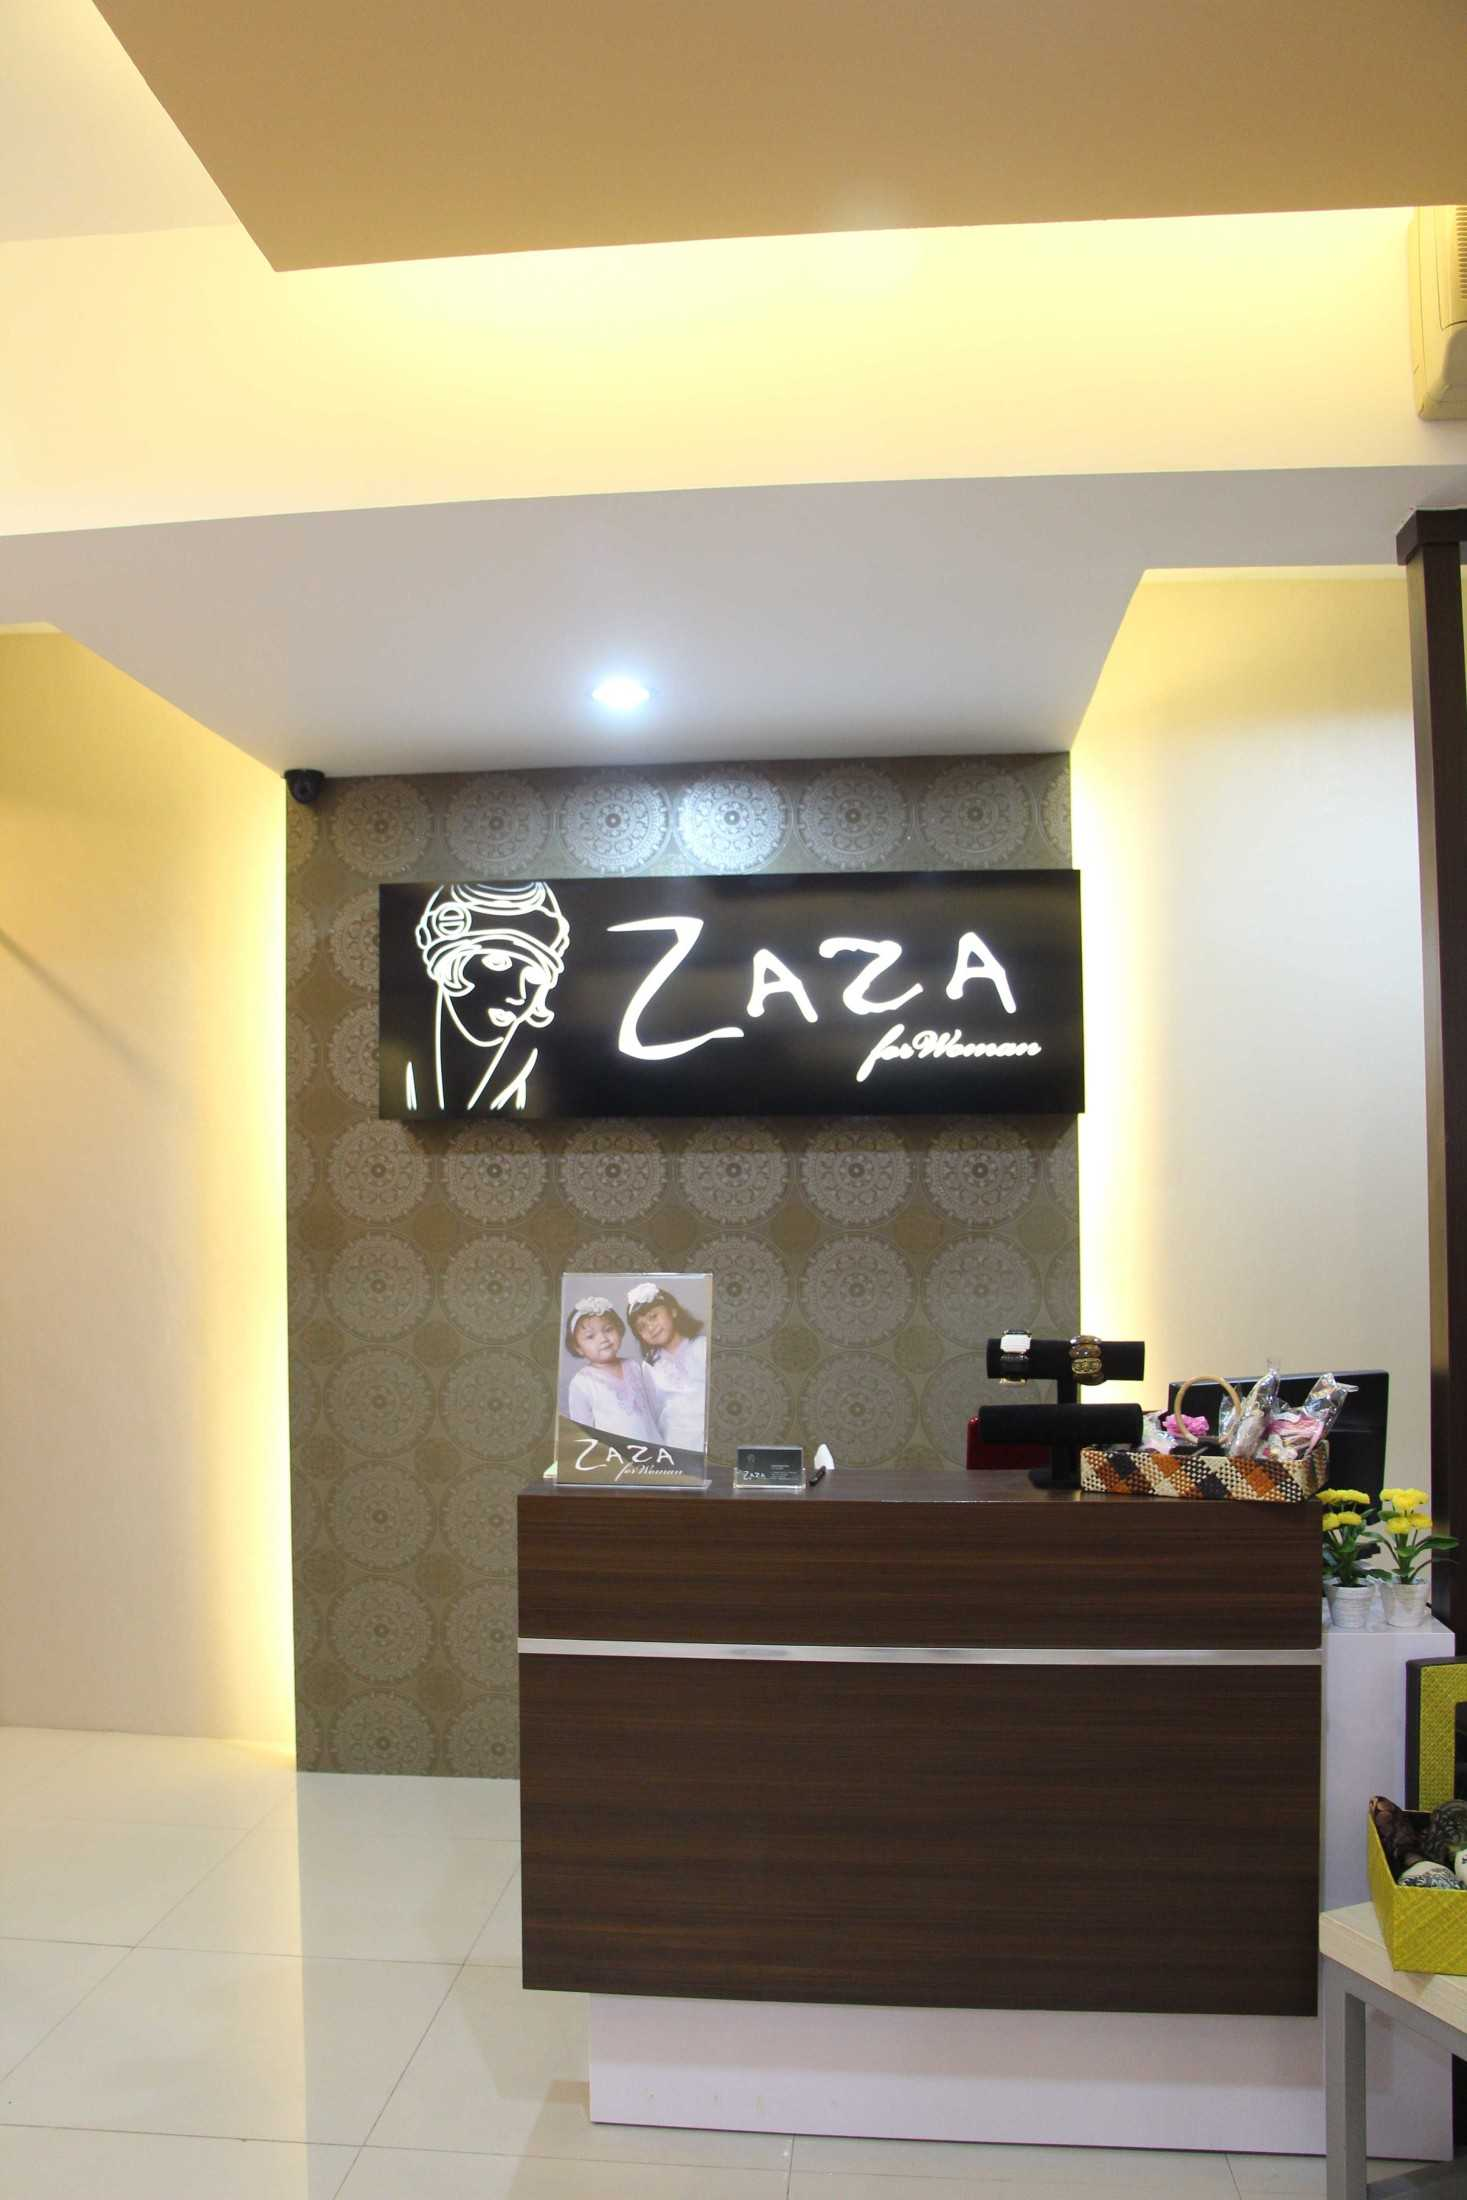 4Linked Architect Butik Zaza Surabaya, Kota Sby, Jawa Timur, Indonesia Surabaya, Kota Sby, Jawa Timur, Indonesia 4Linked-Architect-Butik-Zaza  75196